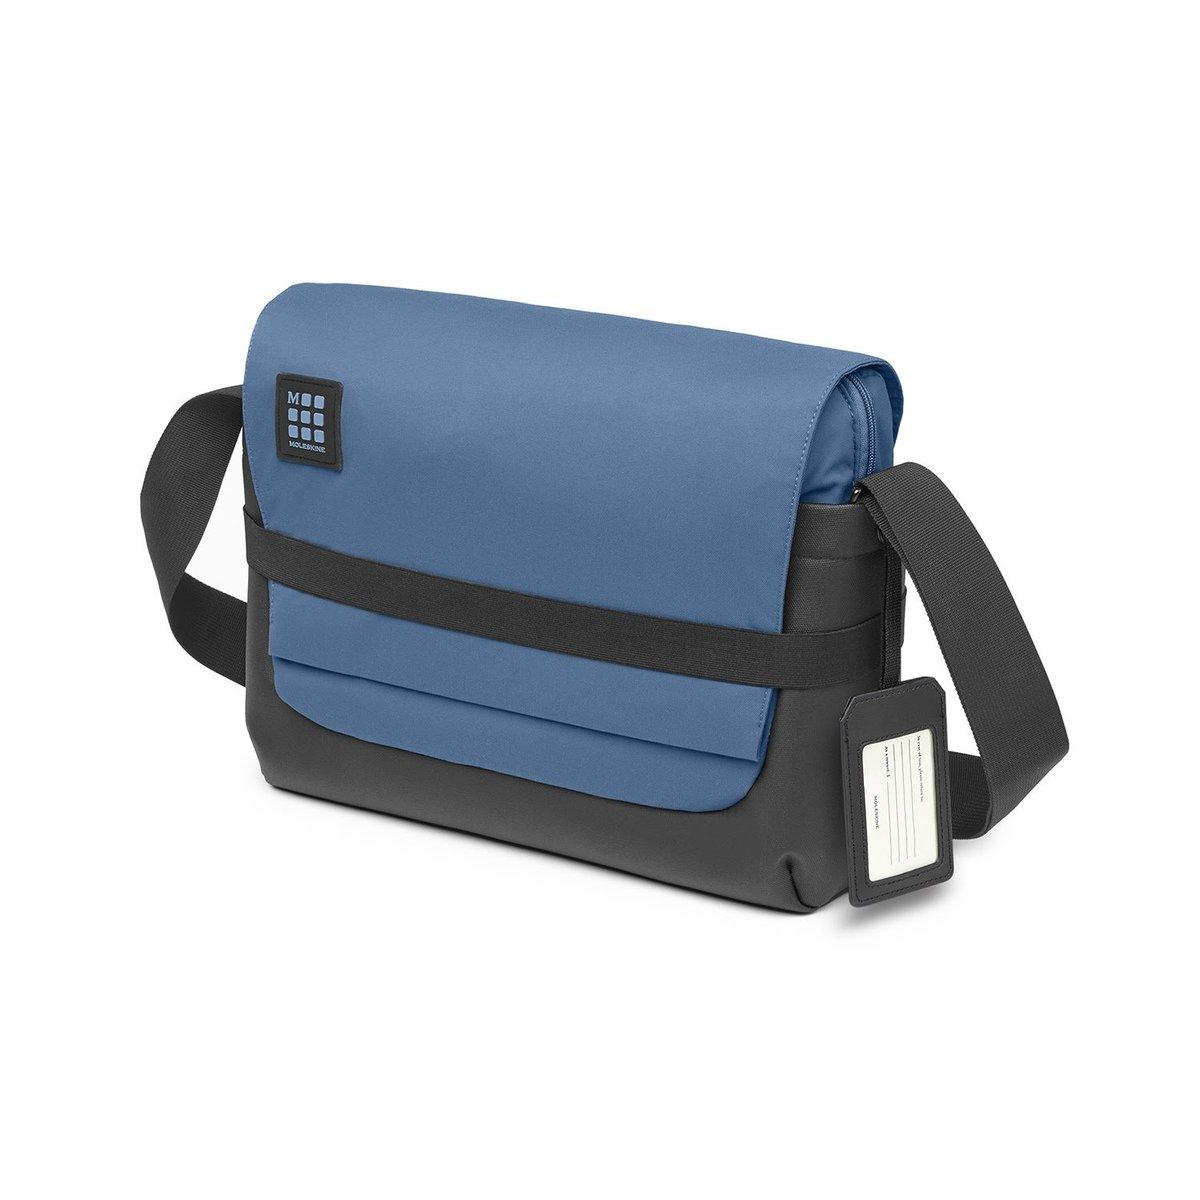 Moleskine ID Messenger Bag for Digital Devices up to 15'' BOREAL BLUE